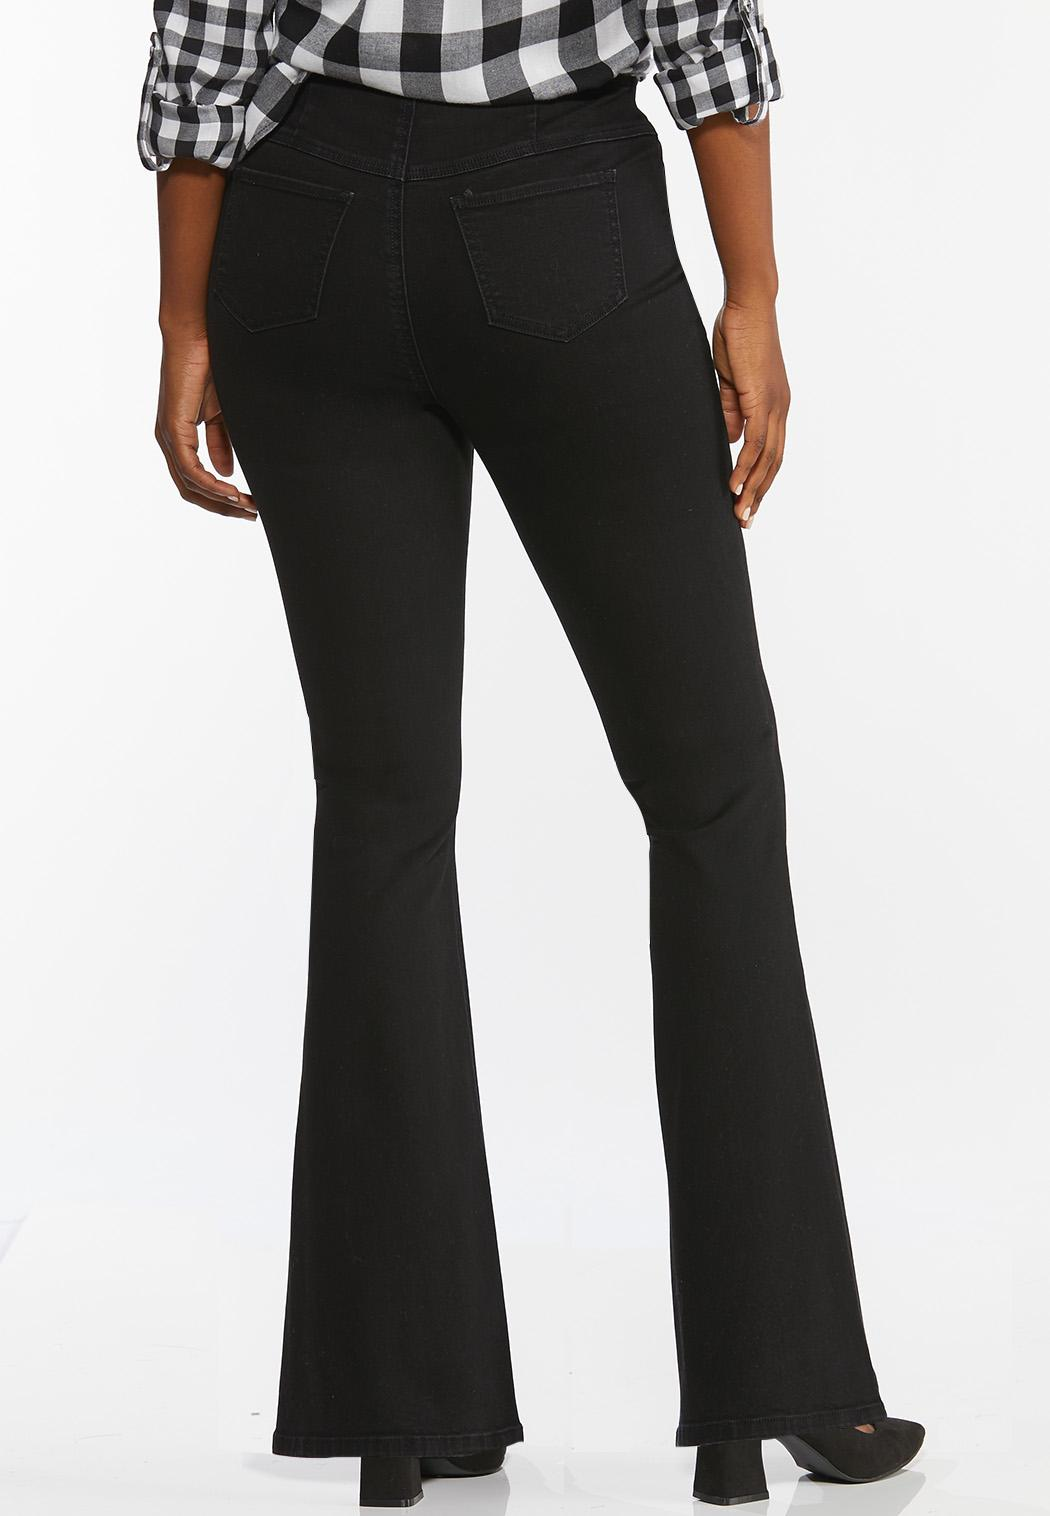 Black Pull-On Flare Jeans (Item #44422800)